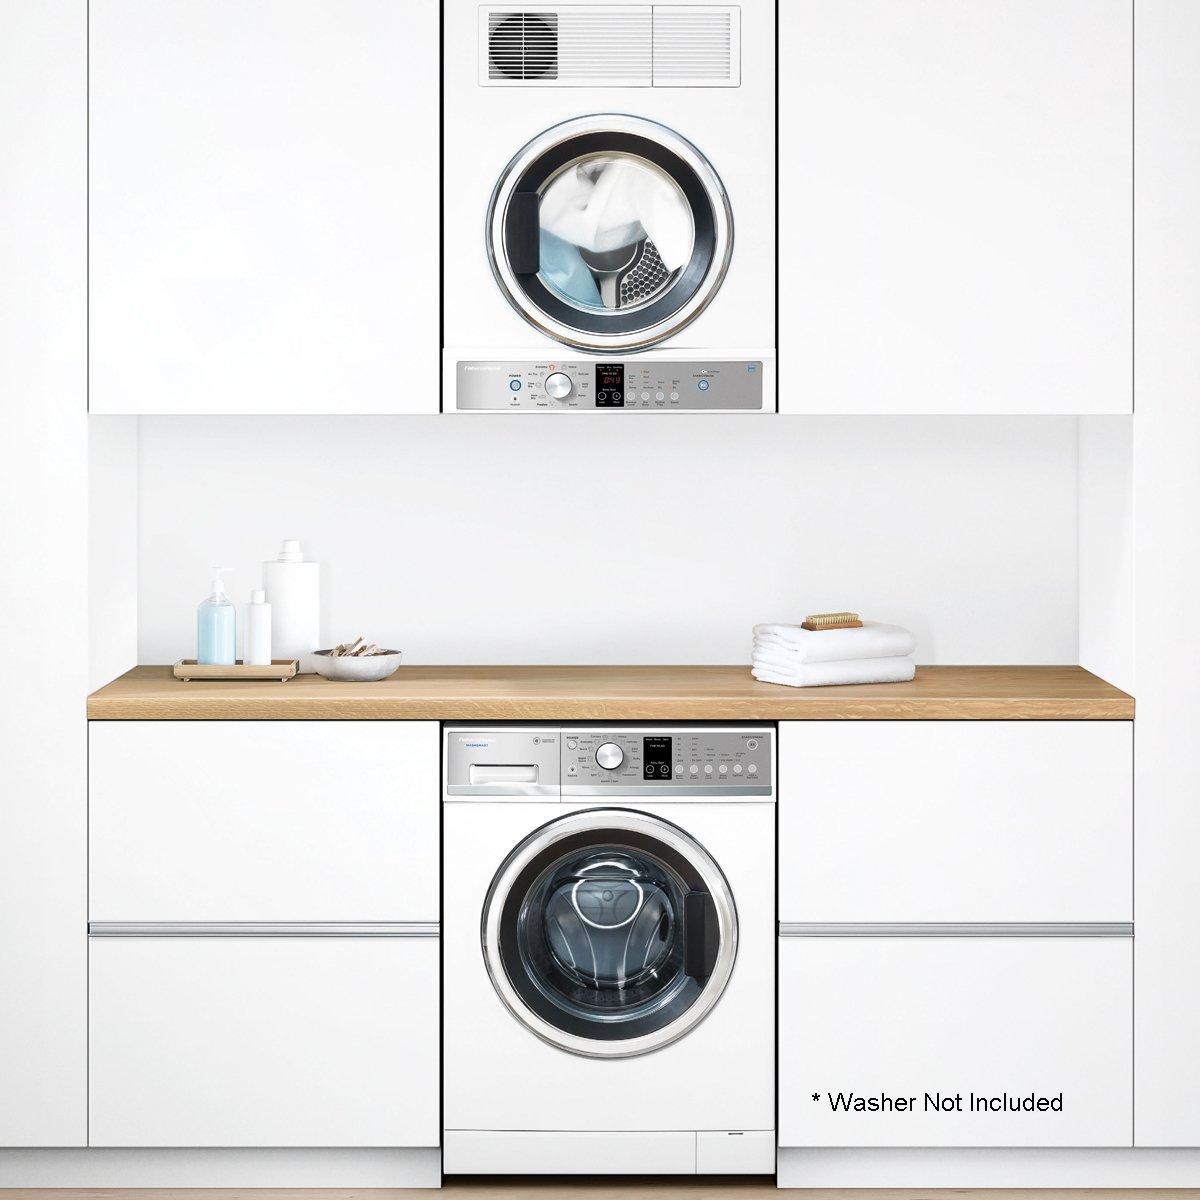 Fisher Paykel DE6060P1 6kg Dryer Lifestyle high.jpeg